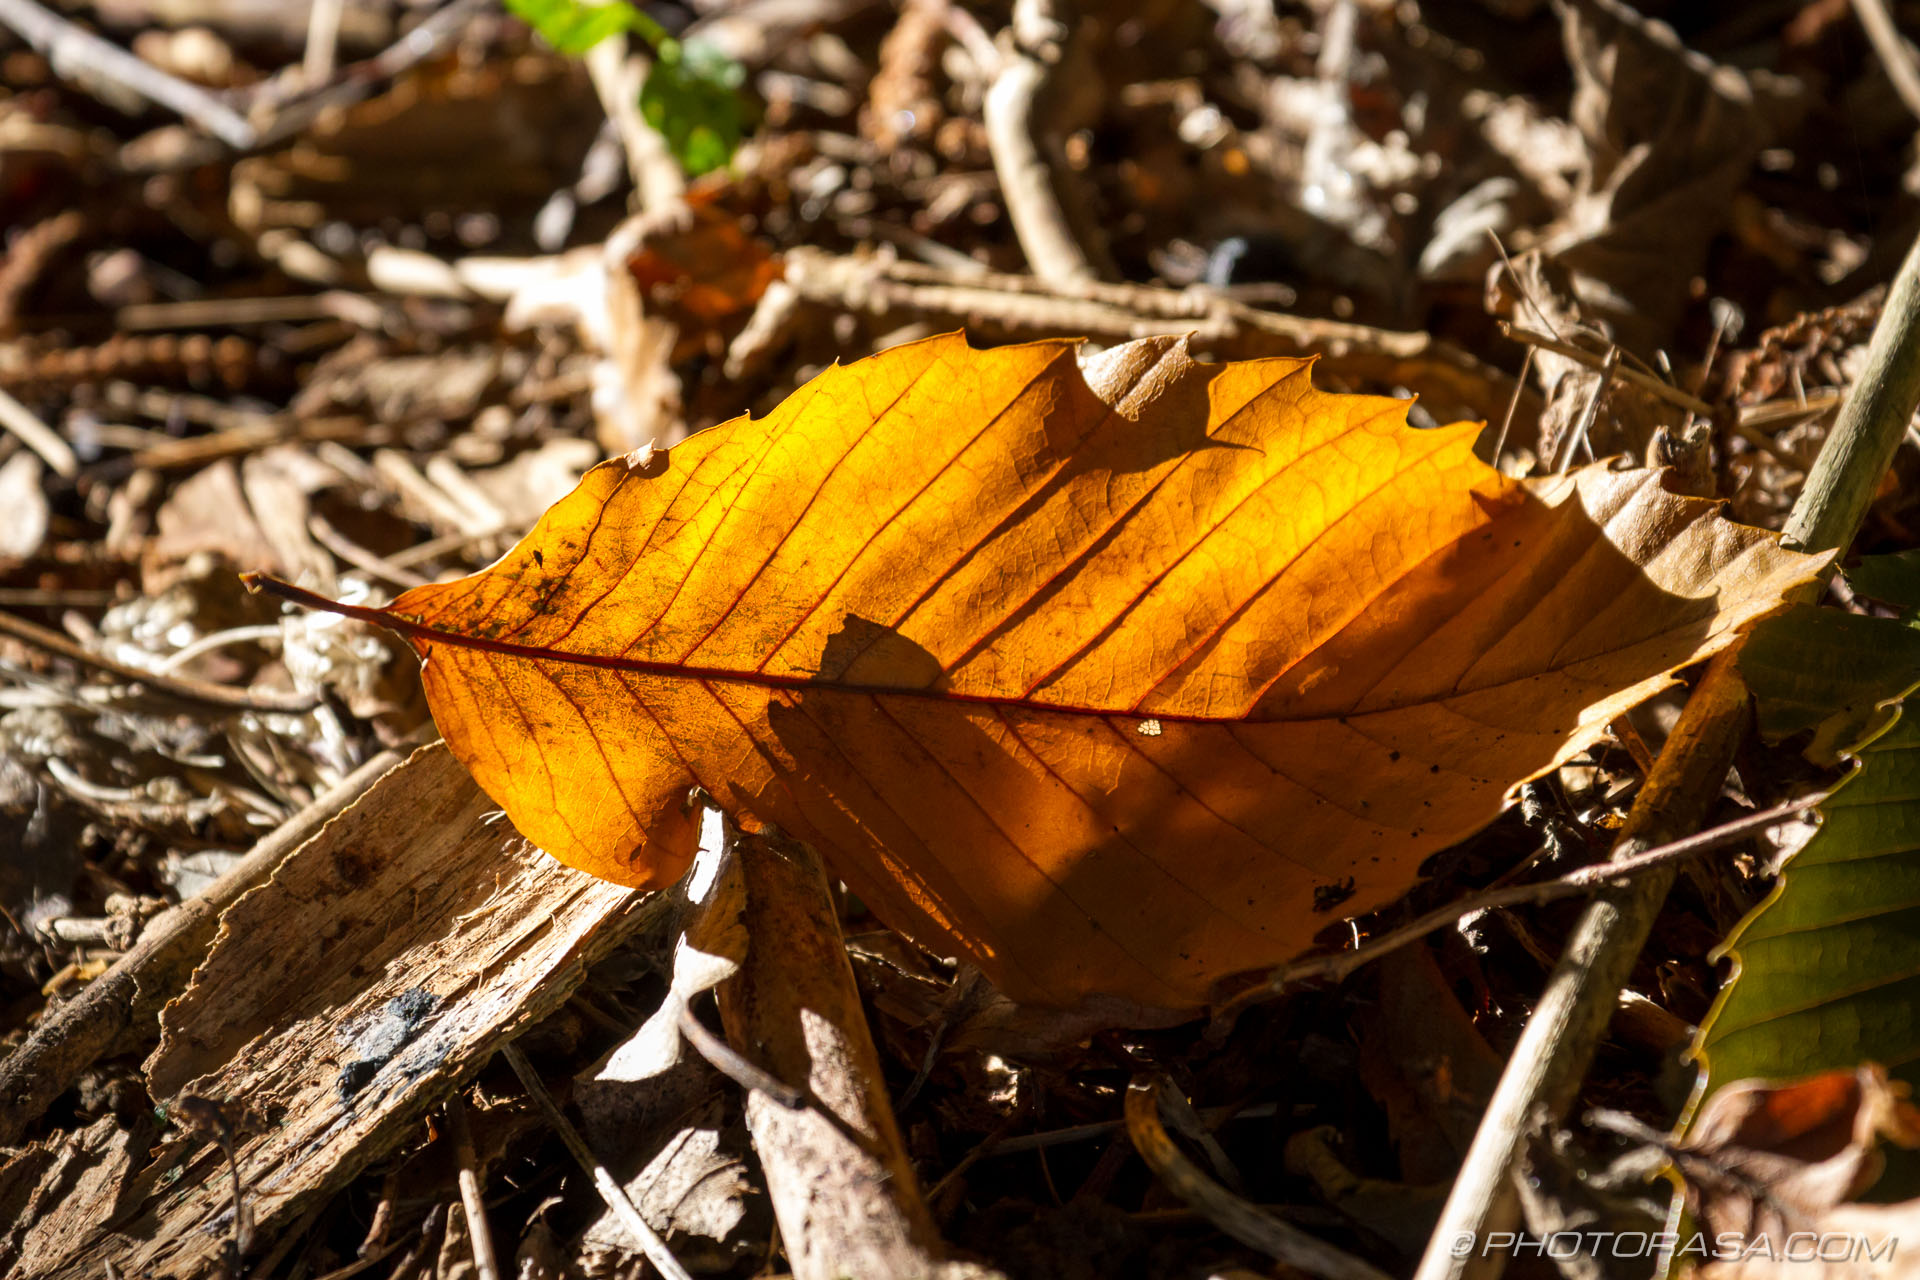 http://photorasa.com/autumn-dappled-light/autumn-leaf-in-sun/